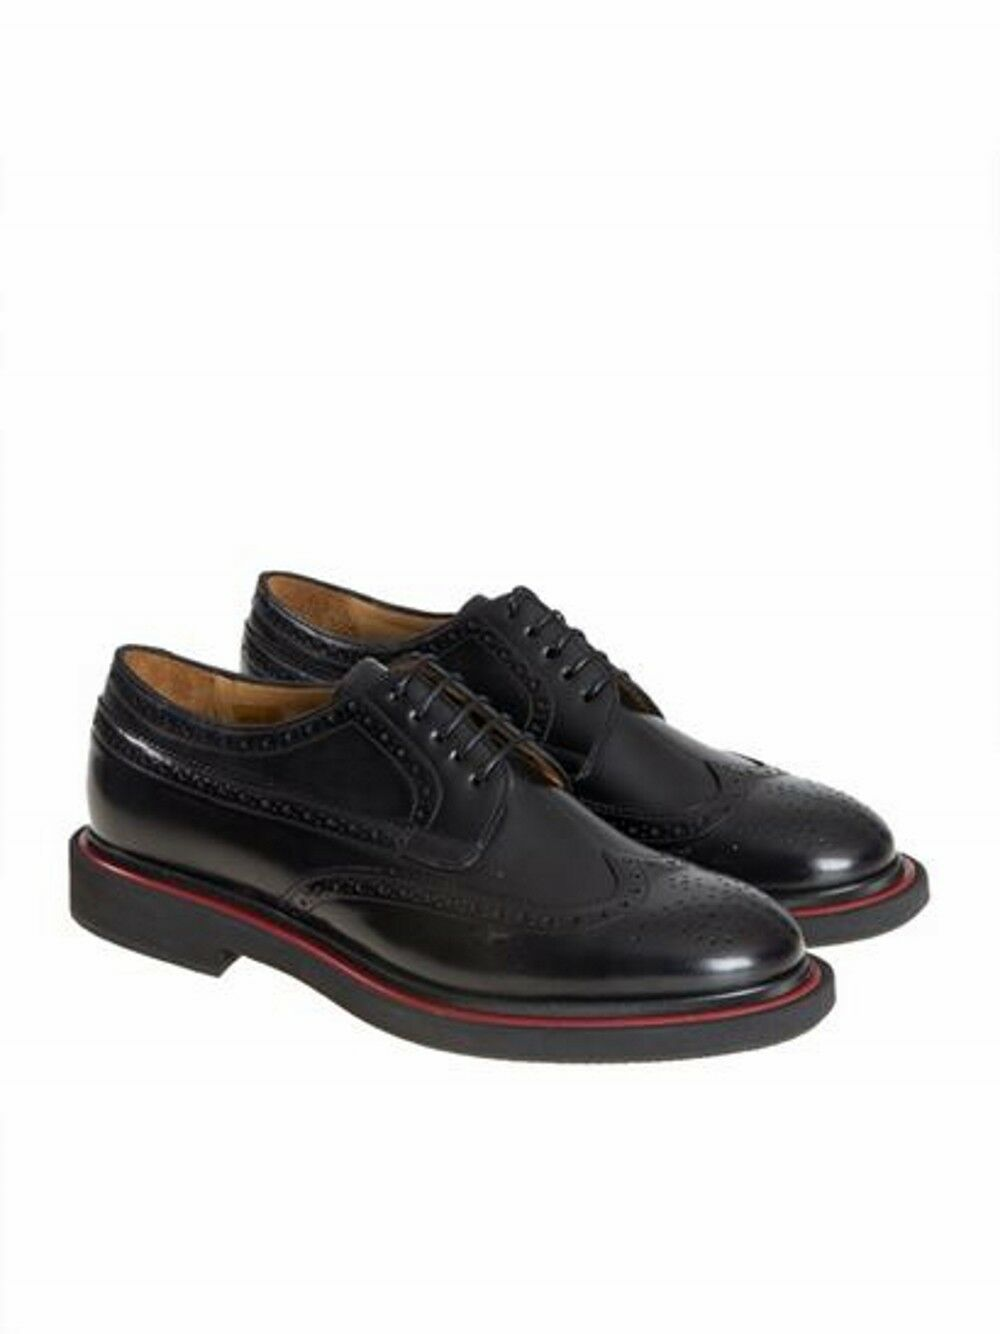 punto vendita Paul Smith Allacciata Junior scarpe scarpe scarpe  vendita online risparmia il 70%